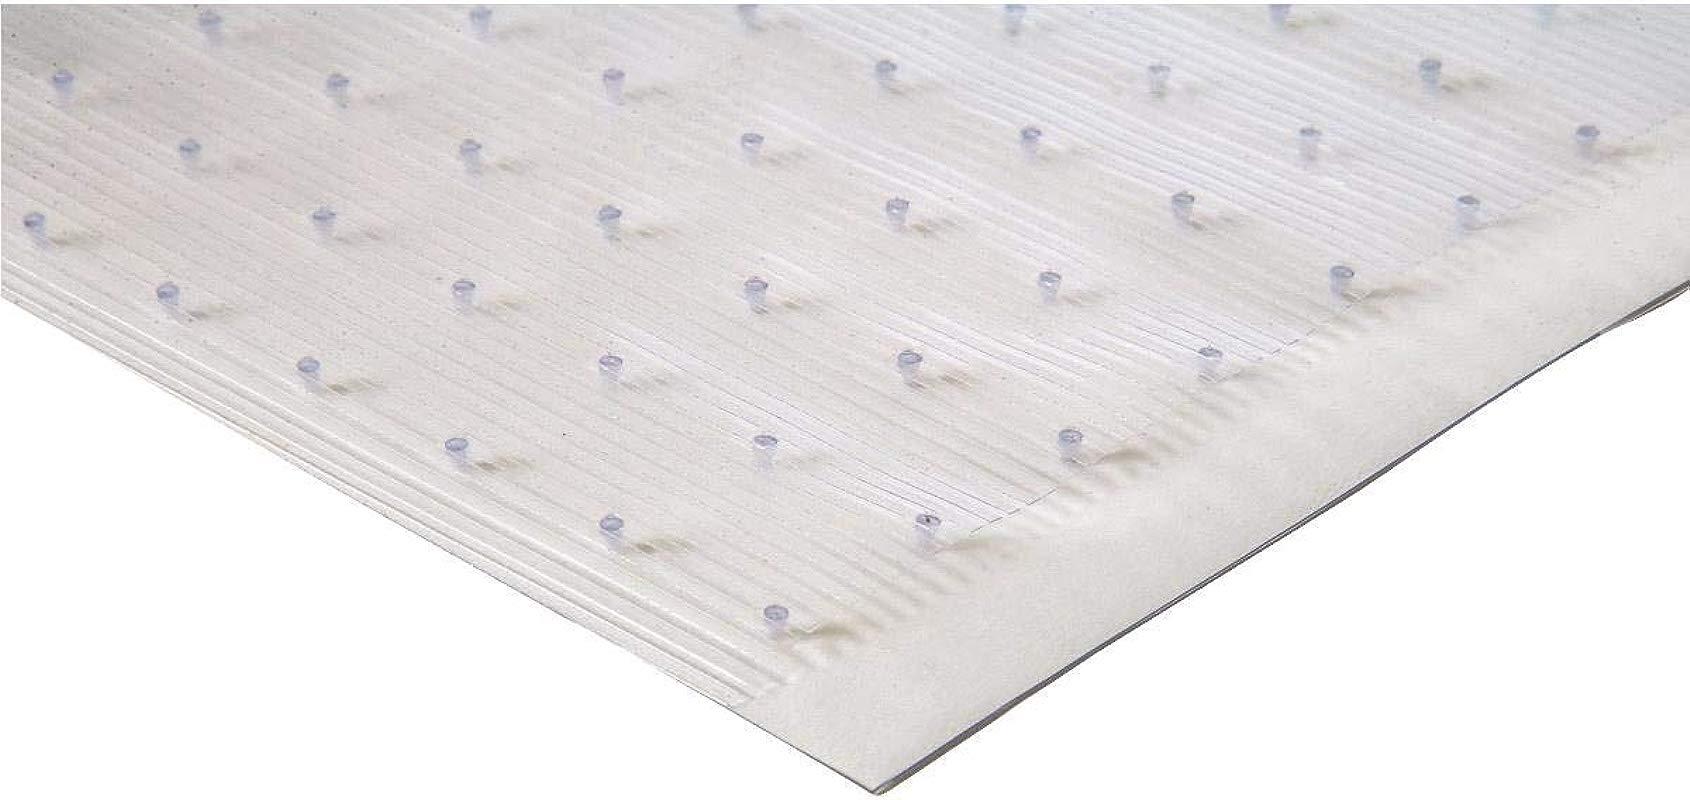 Tenex 27 X 12 Low Pile Carpet Runner